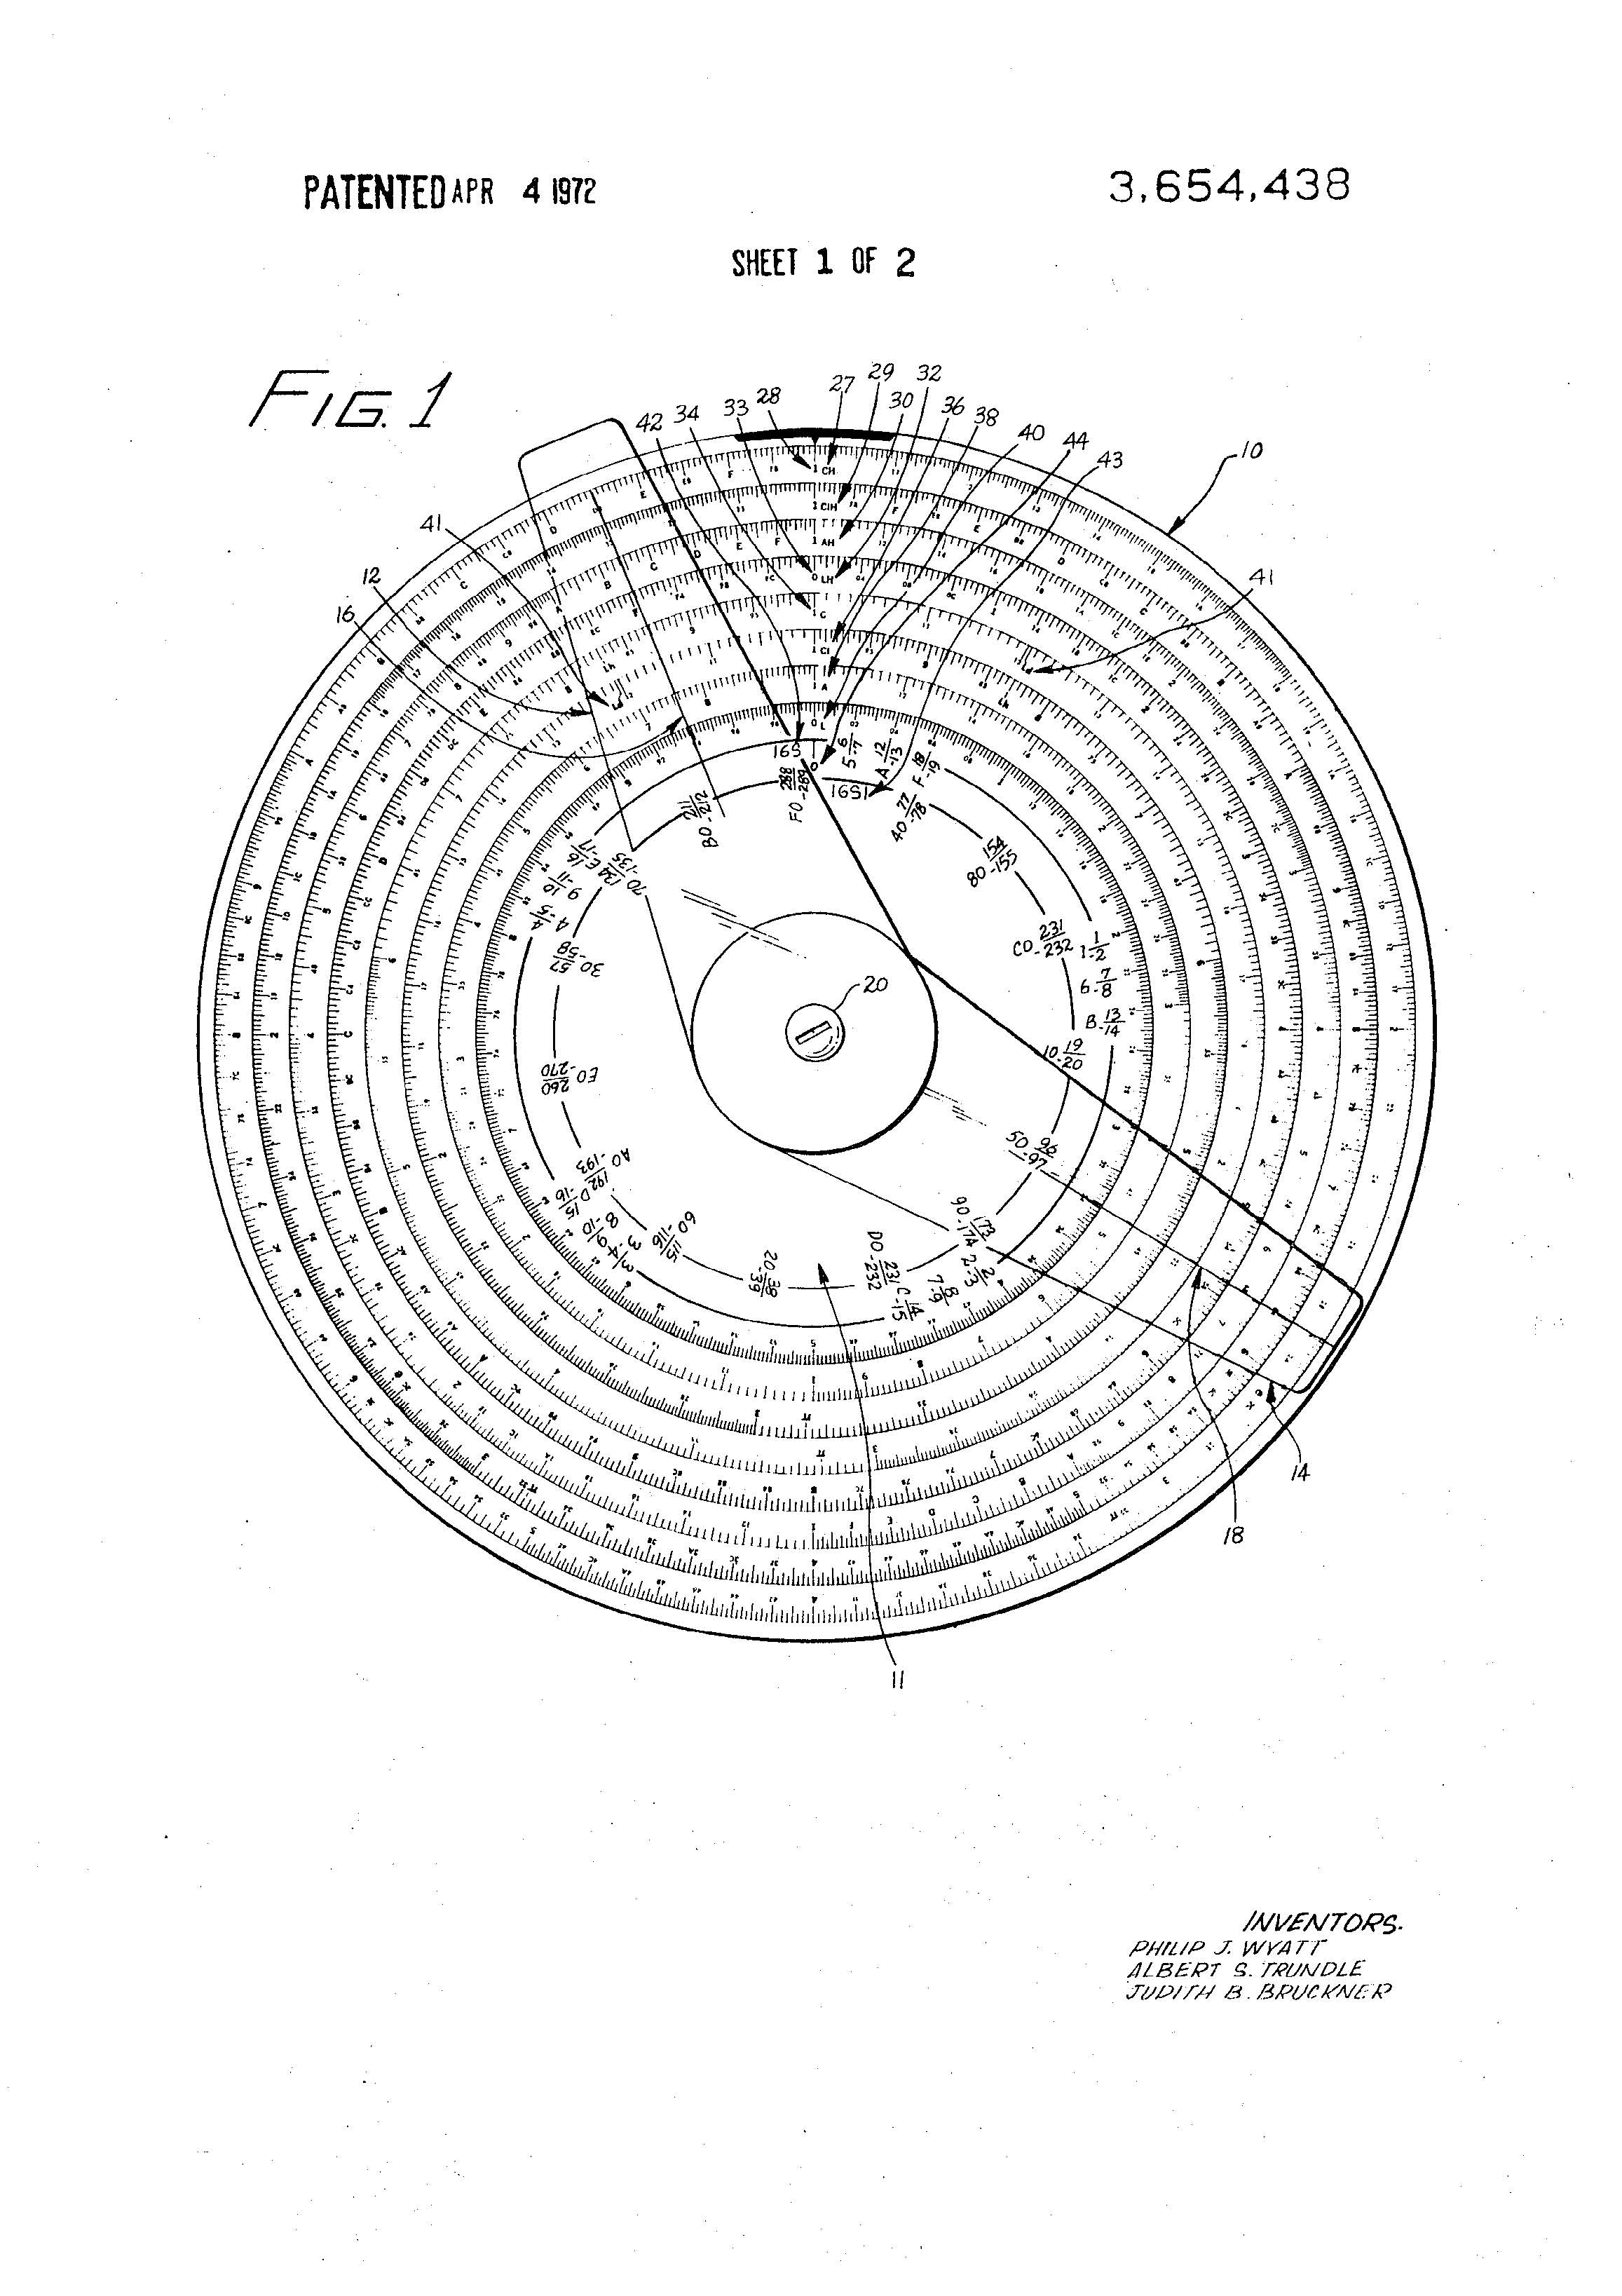 wooldridge solution manual pdf